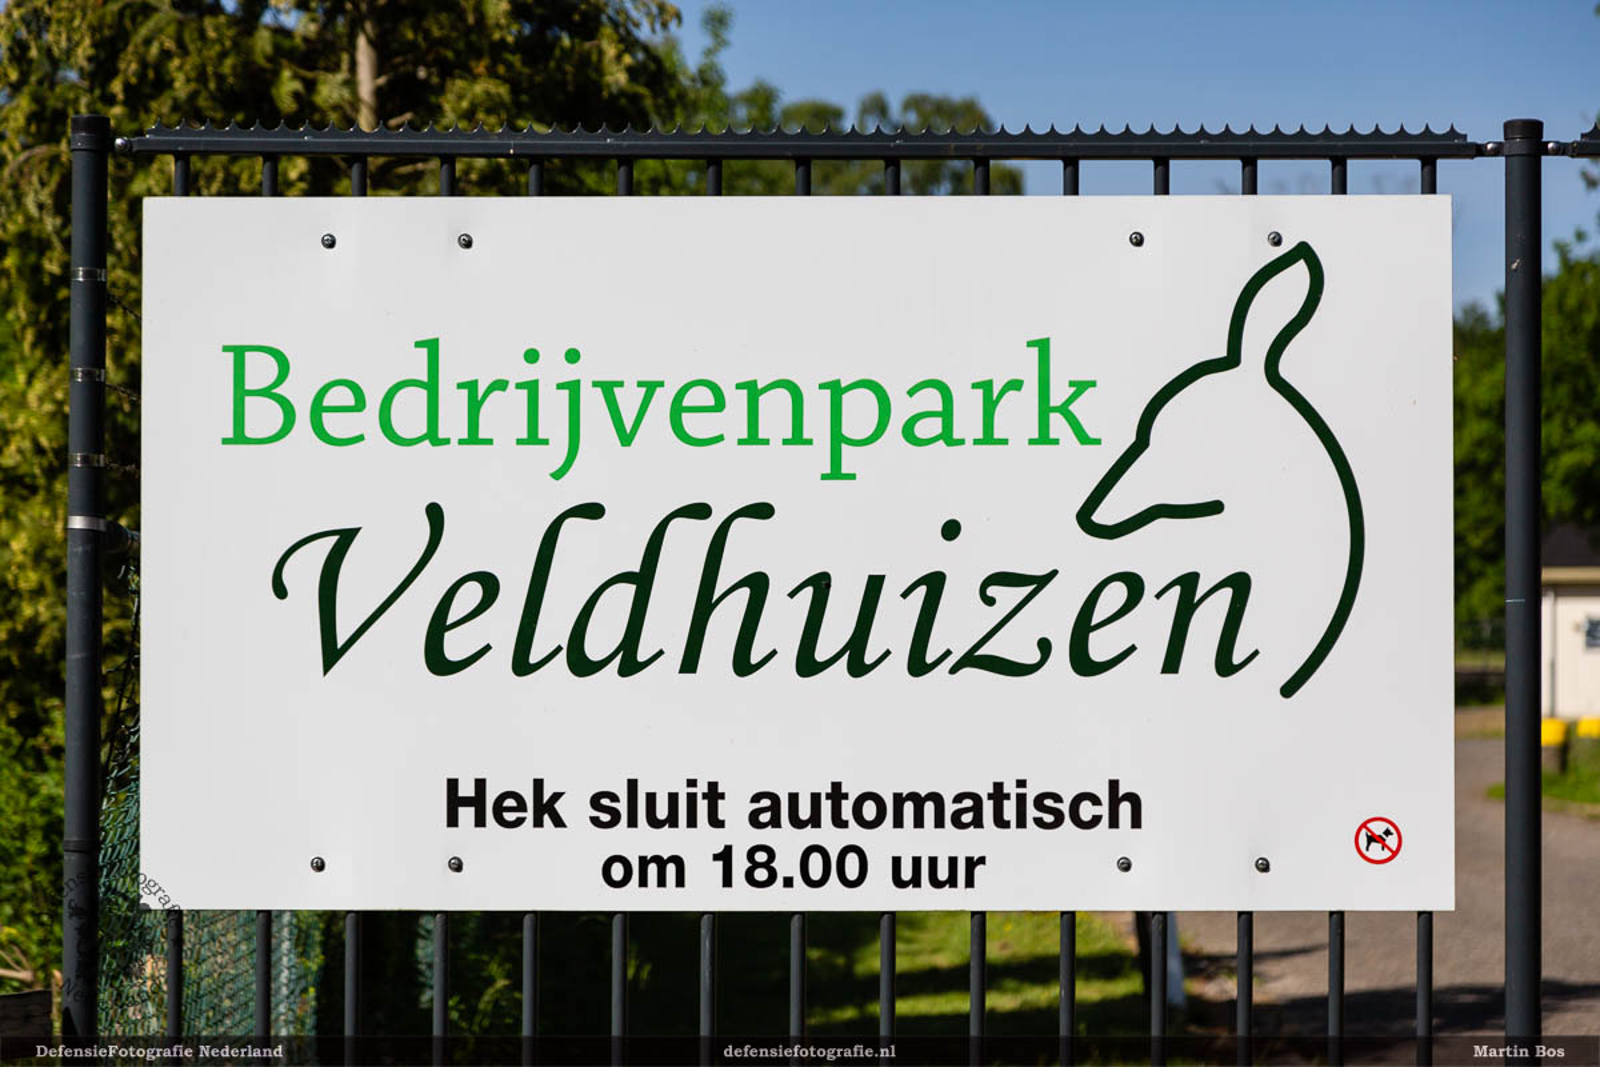 Bedrijvenpark Veldhuizen